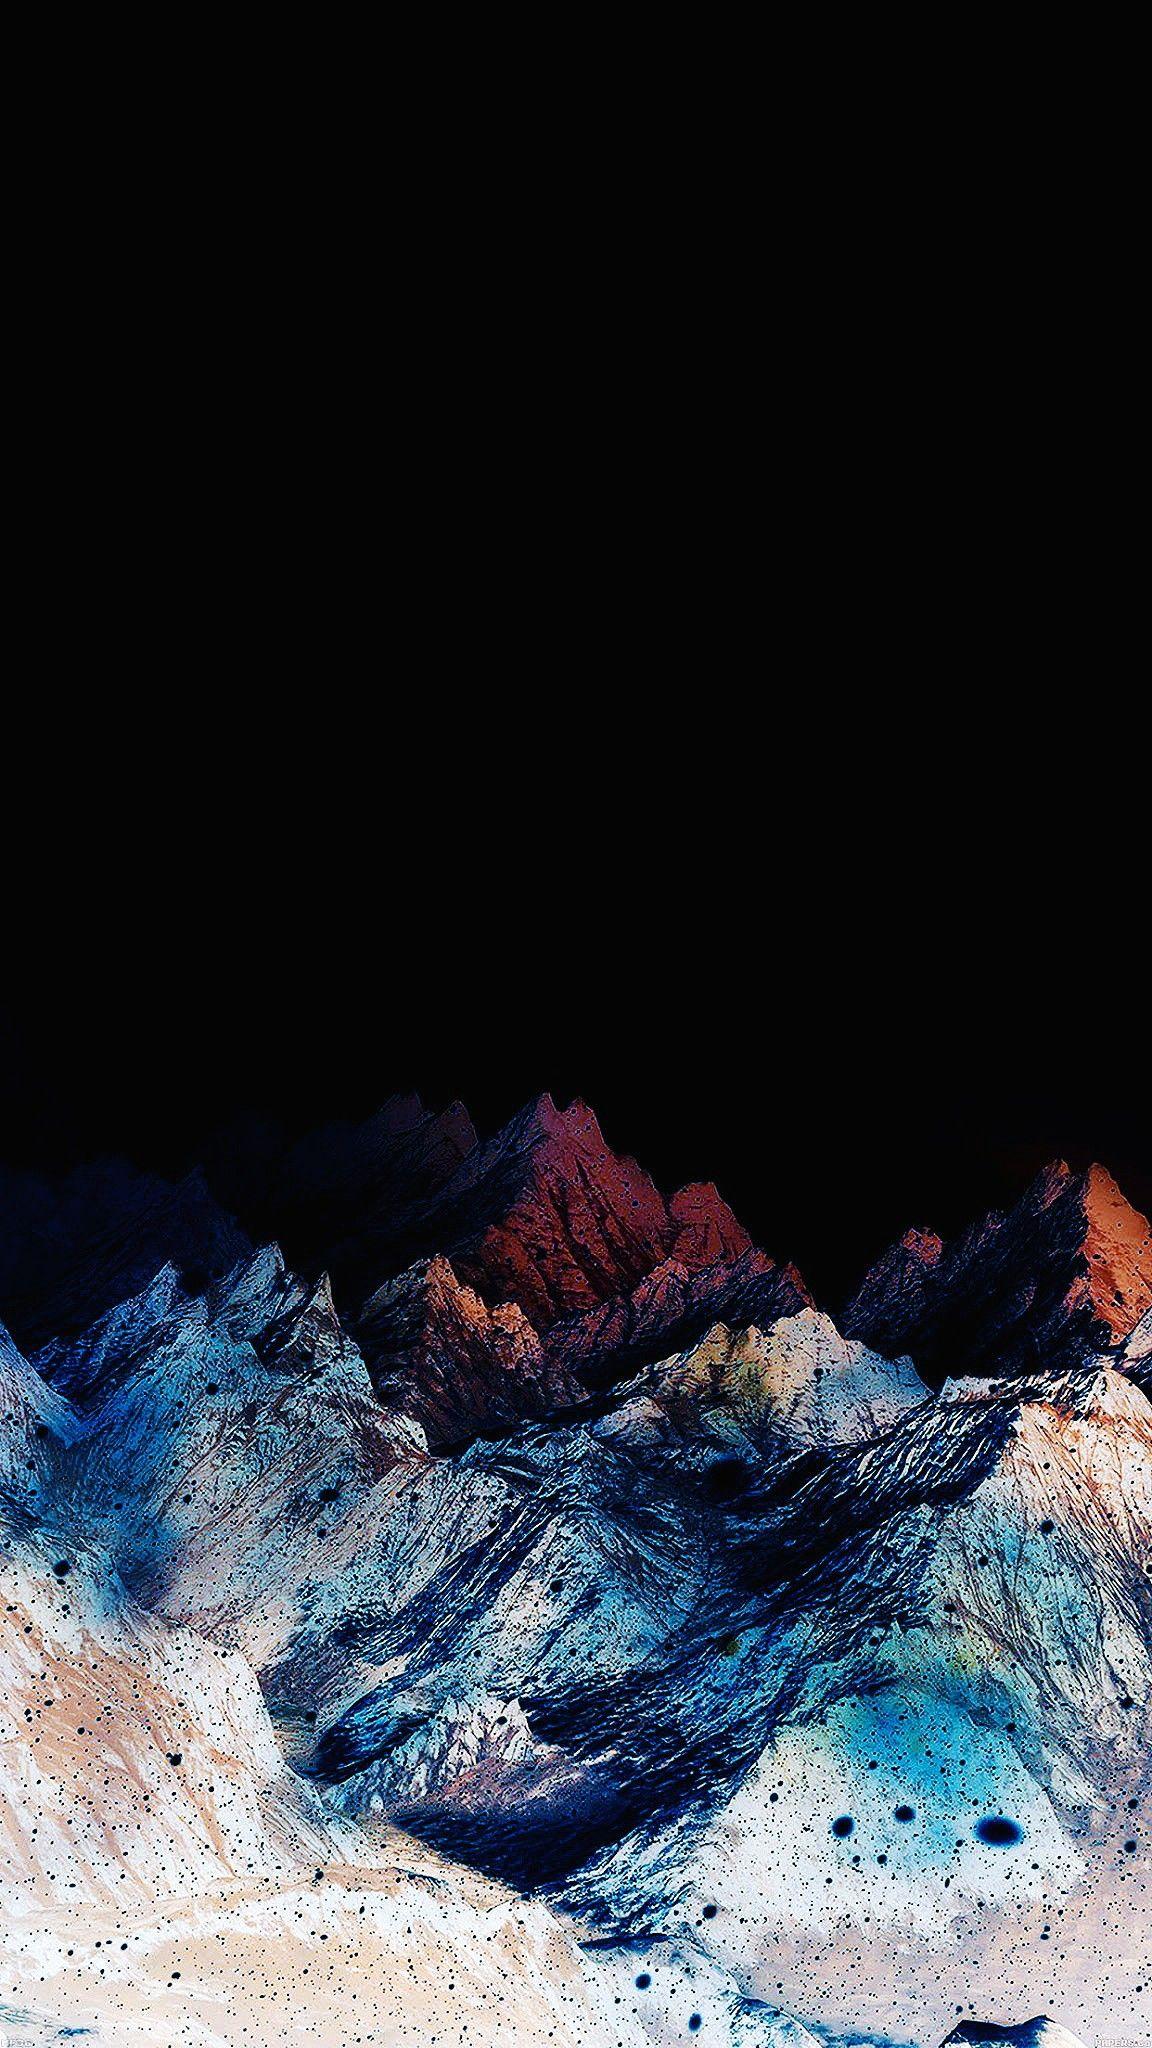 Amoled Screen Wallpaper - Best Dark Iphone X , HD Wallpaper & Backgrounds